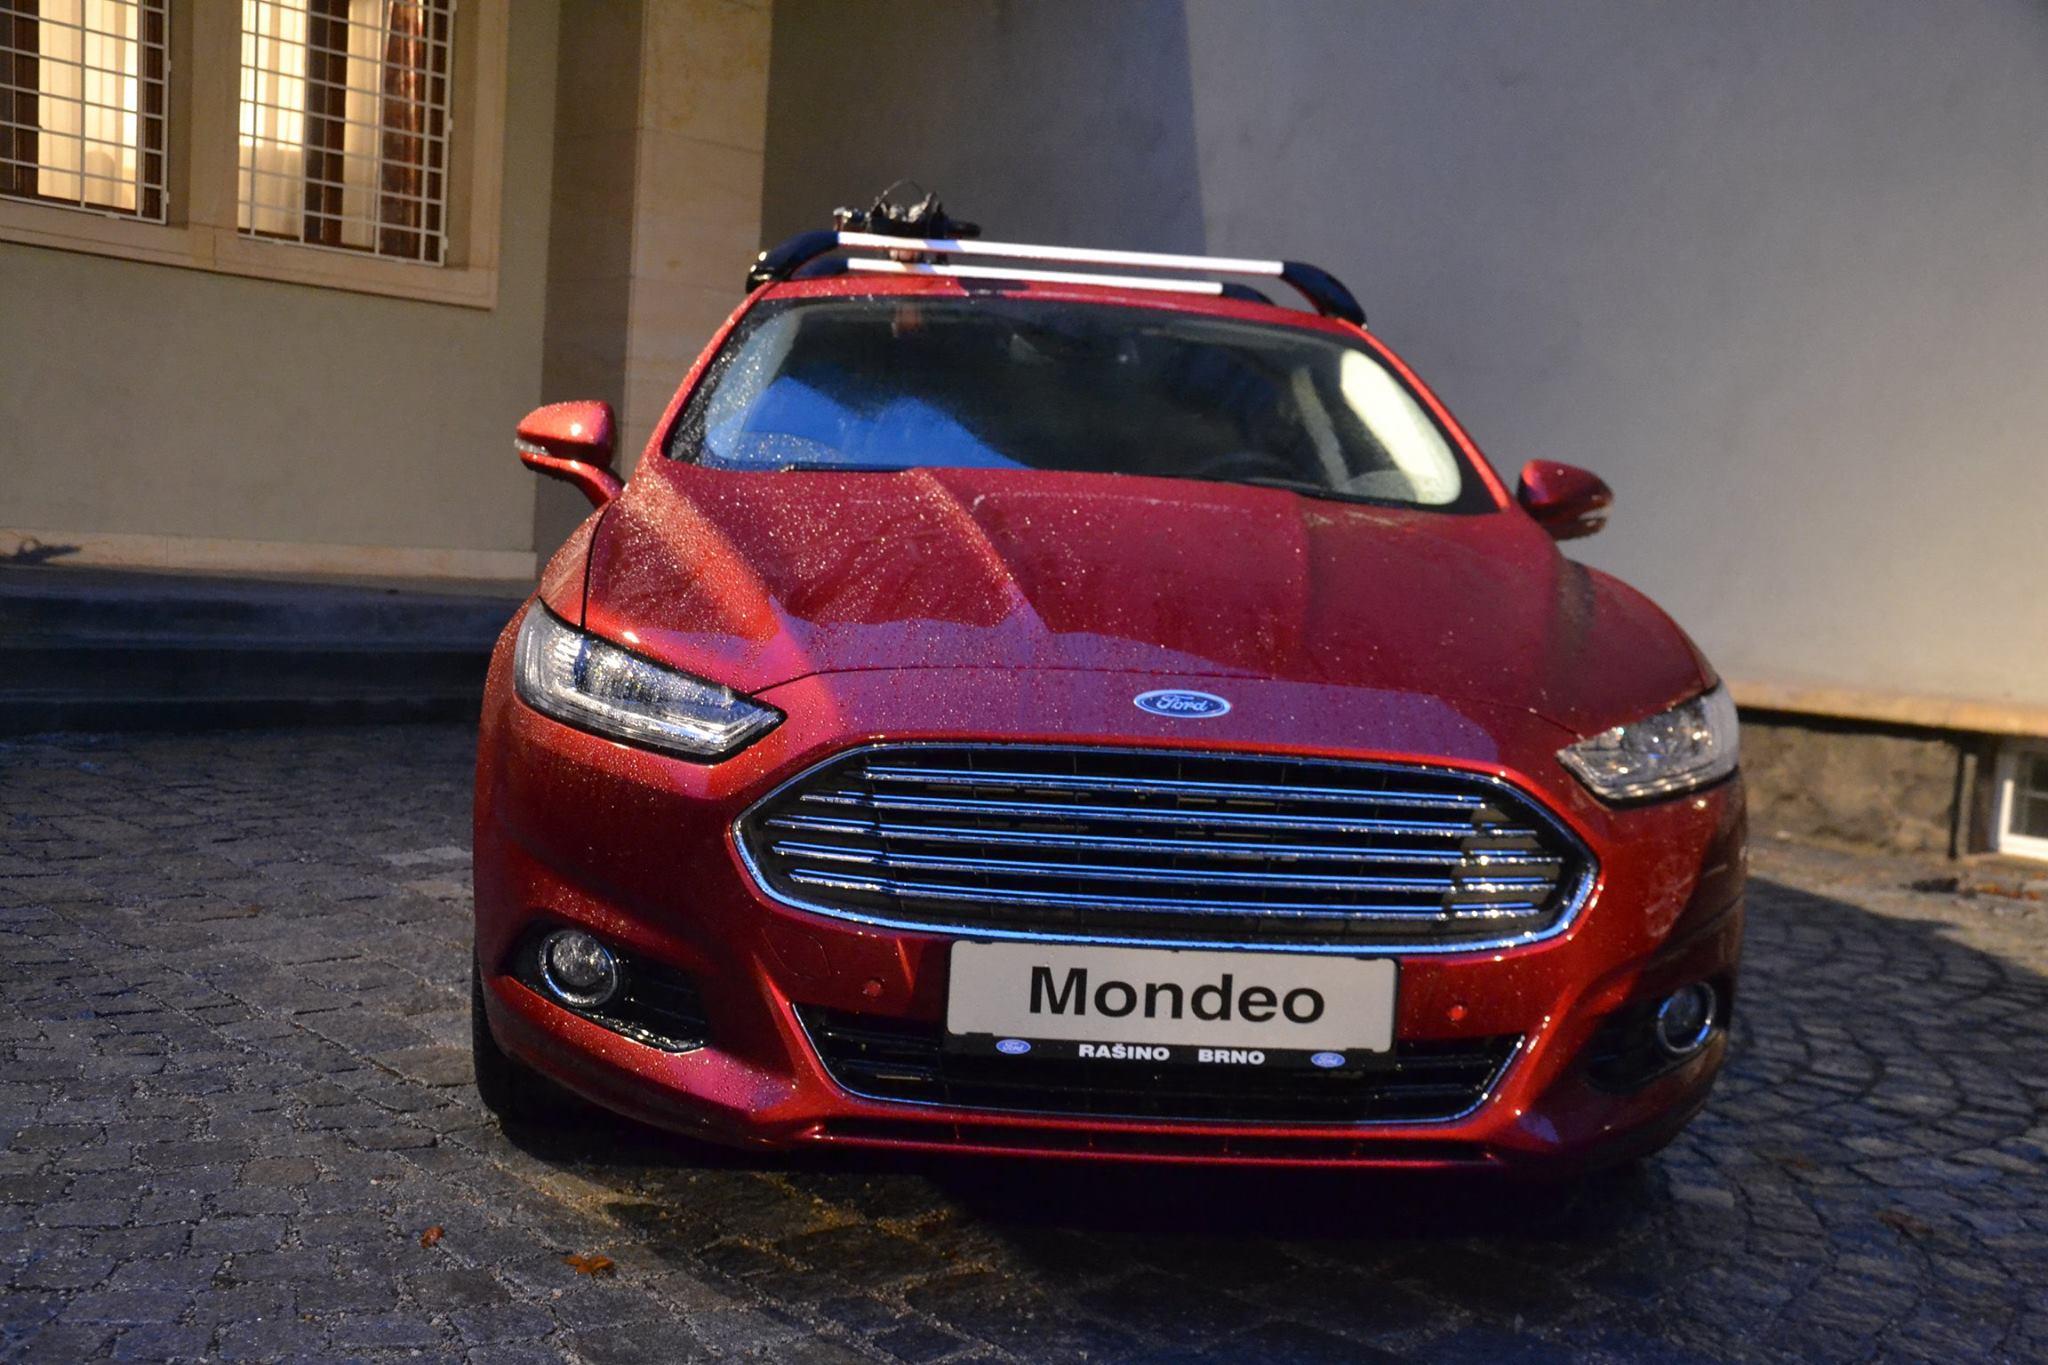 Ford Mondeo - Rašino Brno